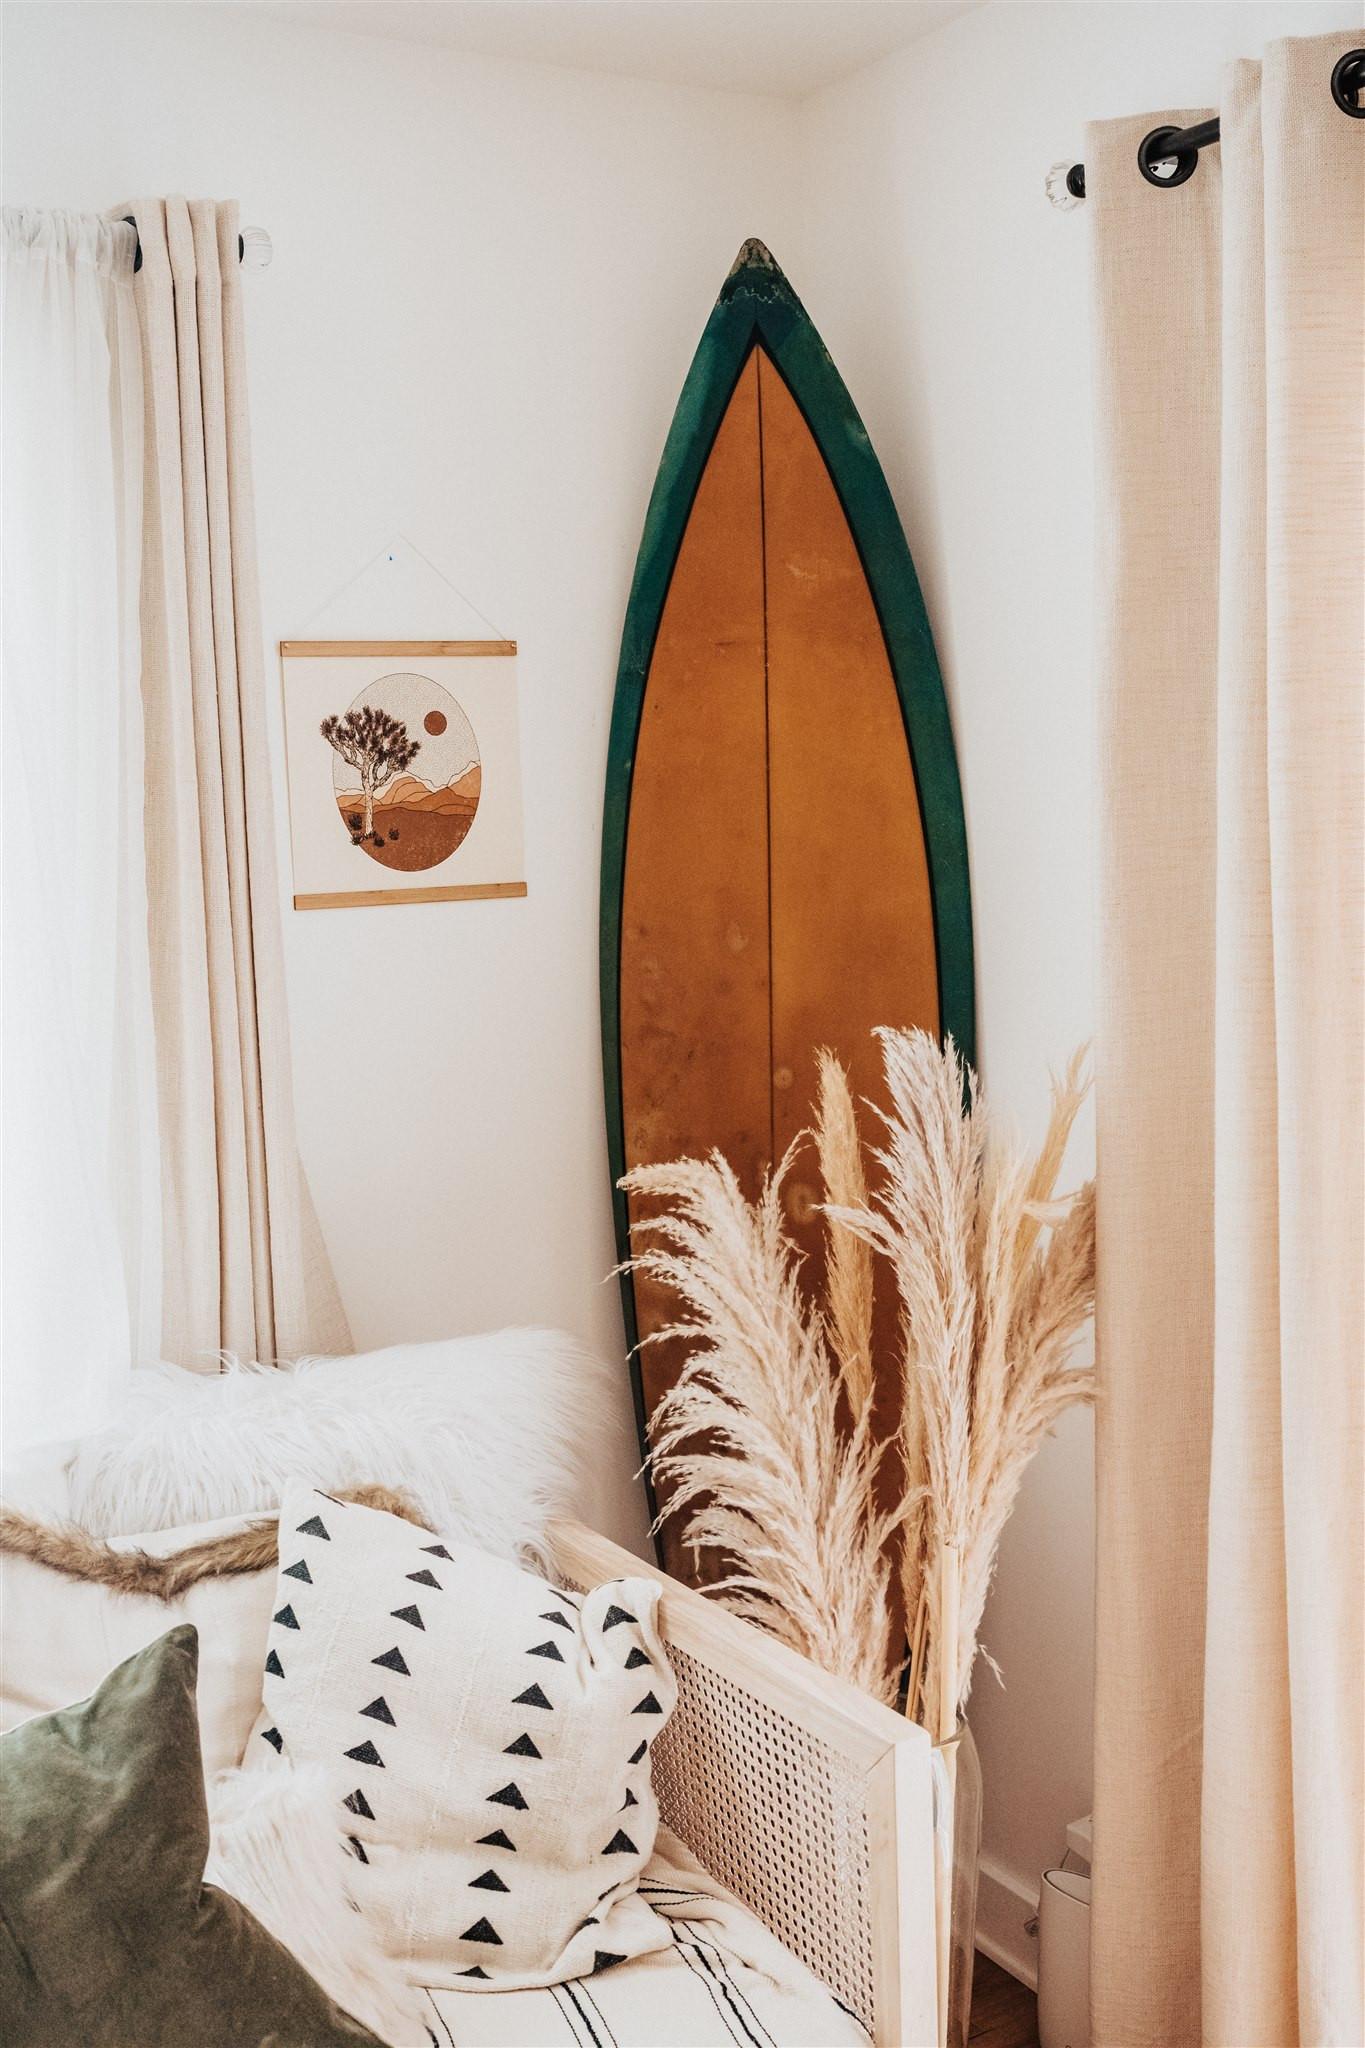 poster hanger bamboo wood